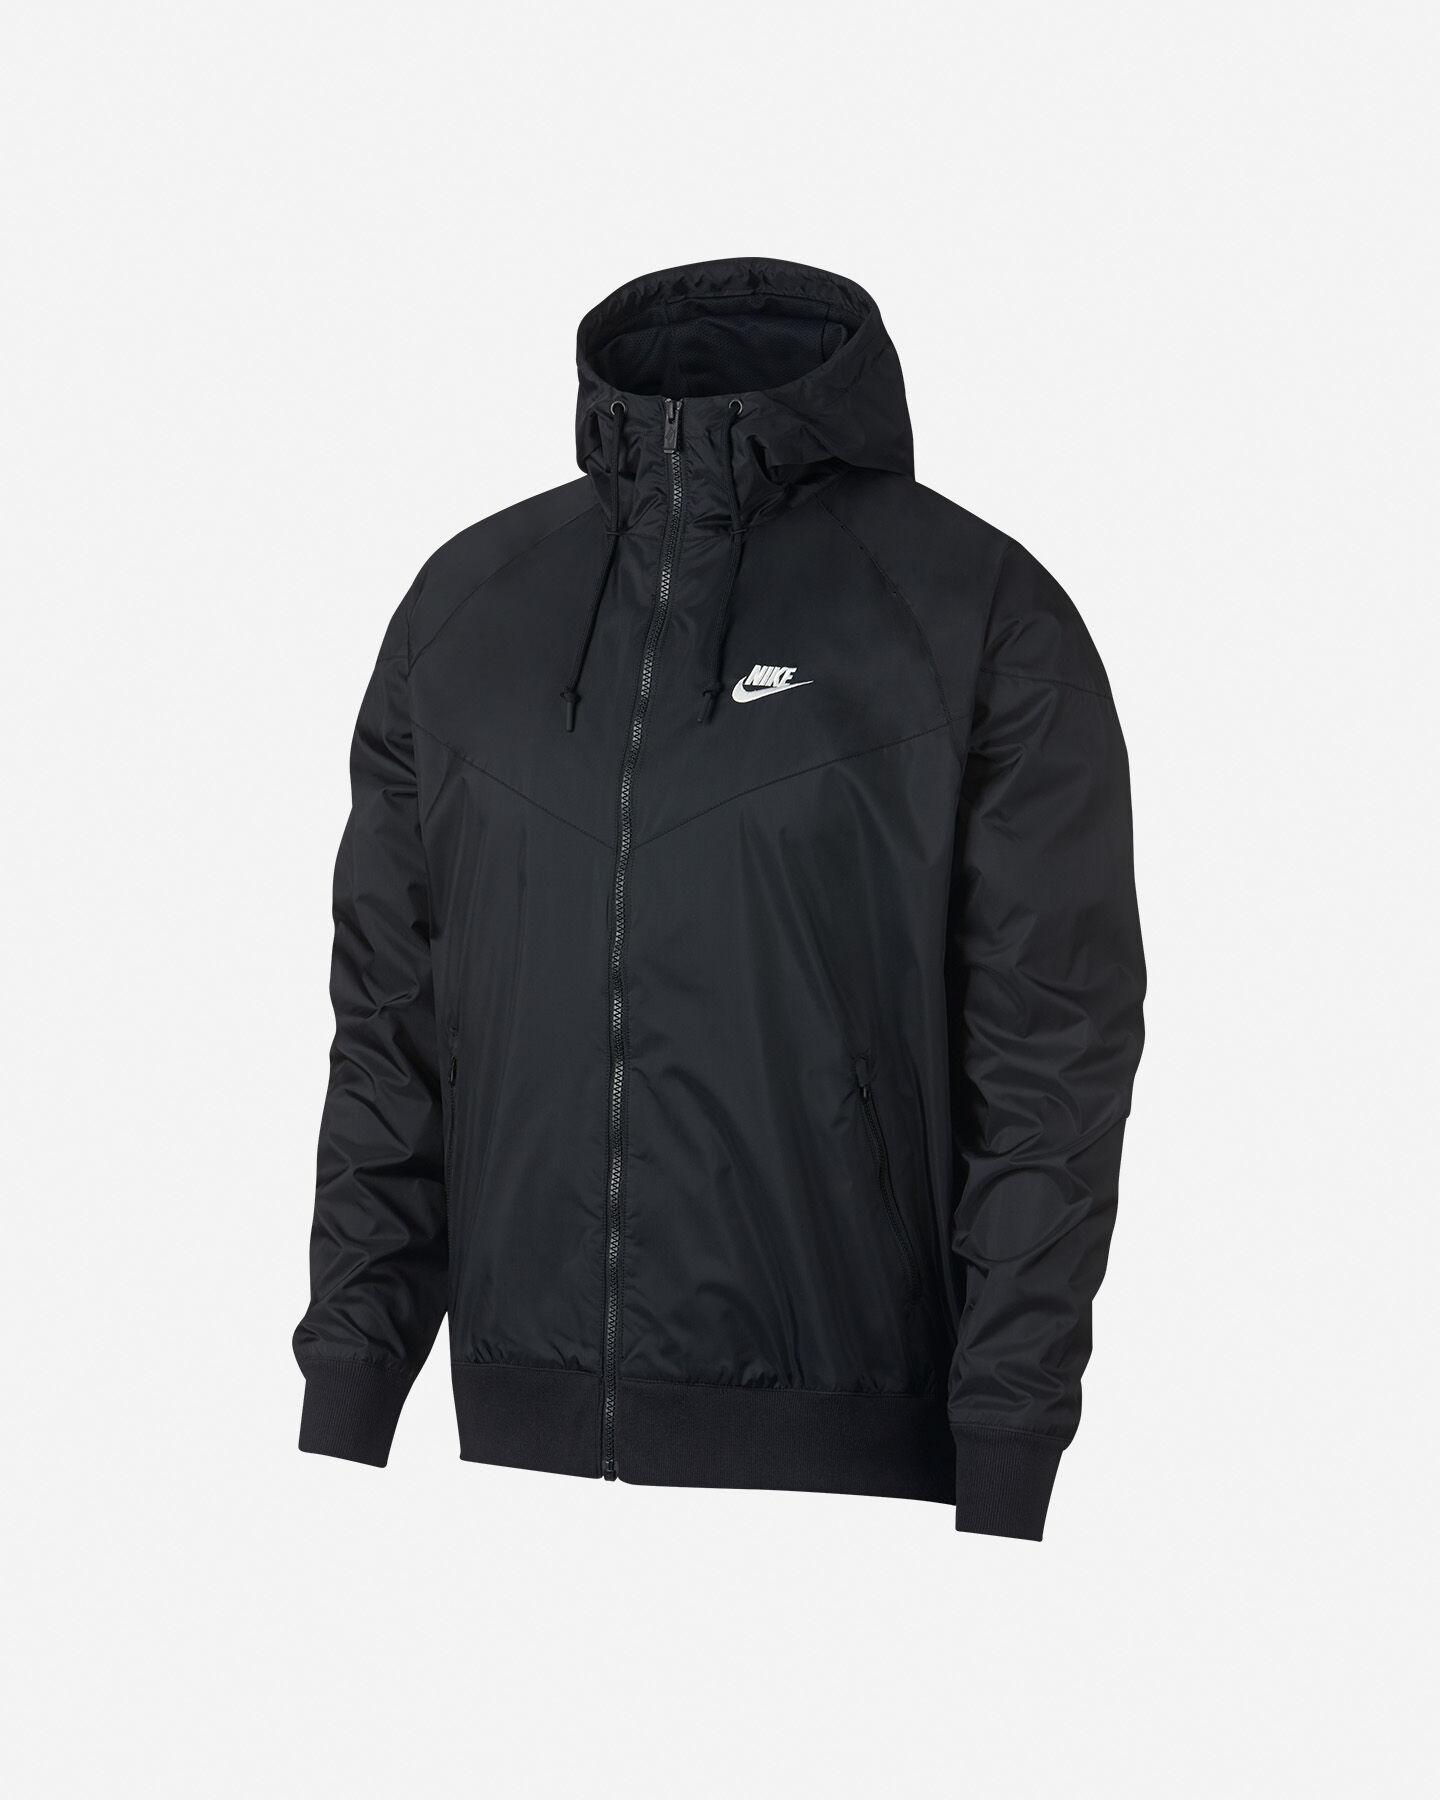 Felpa Uomo Nike M NSW Heritage Hoodie FZ Abbigliamento